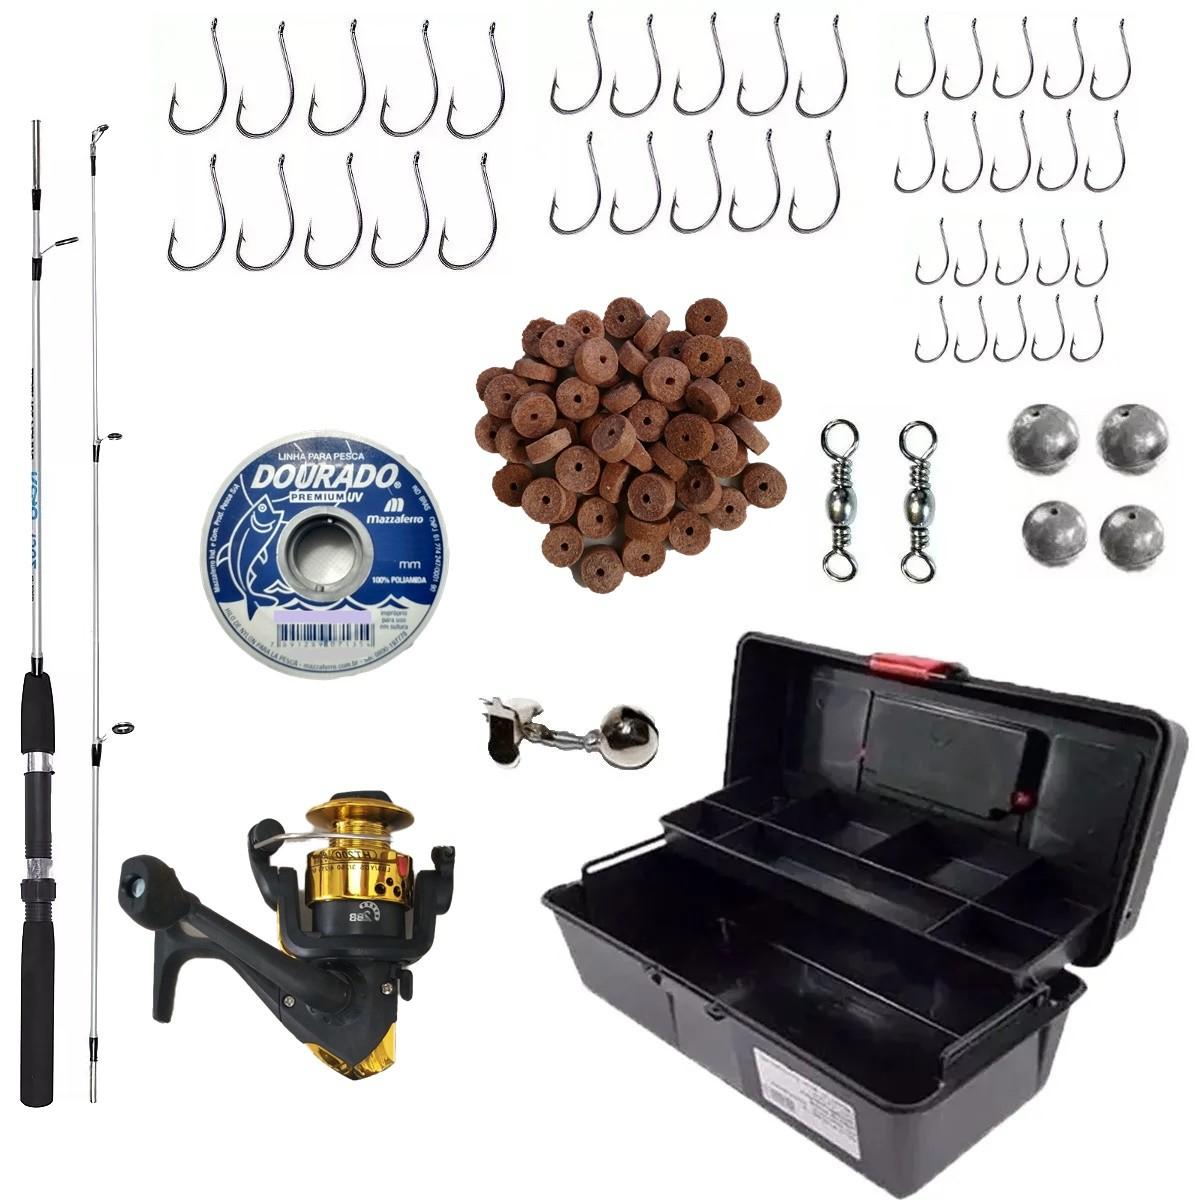 Kit de Pesca Completo Barato Caixa Vara Molinete E Acessórios